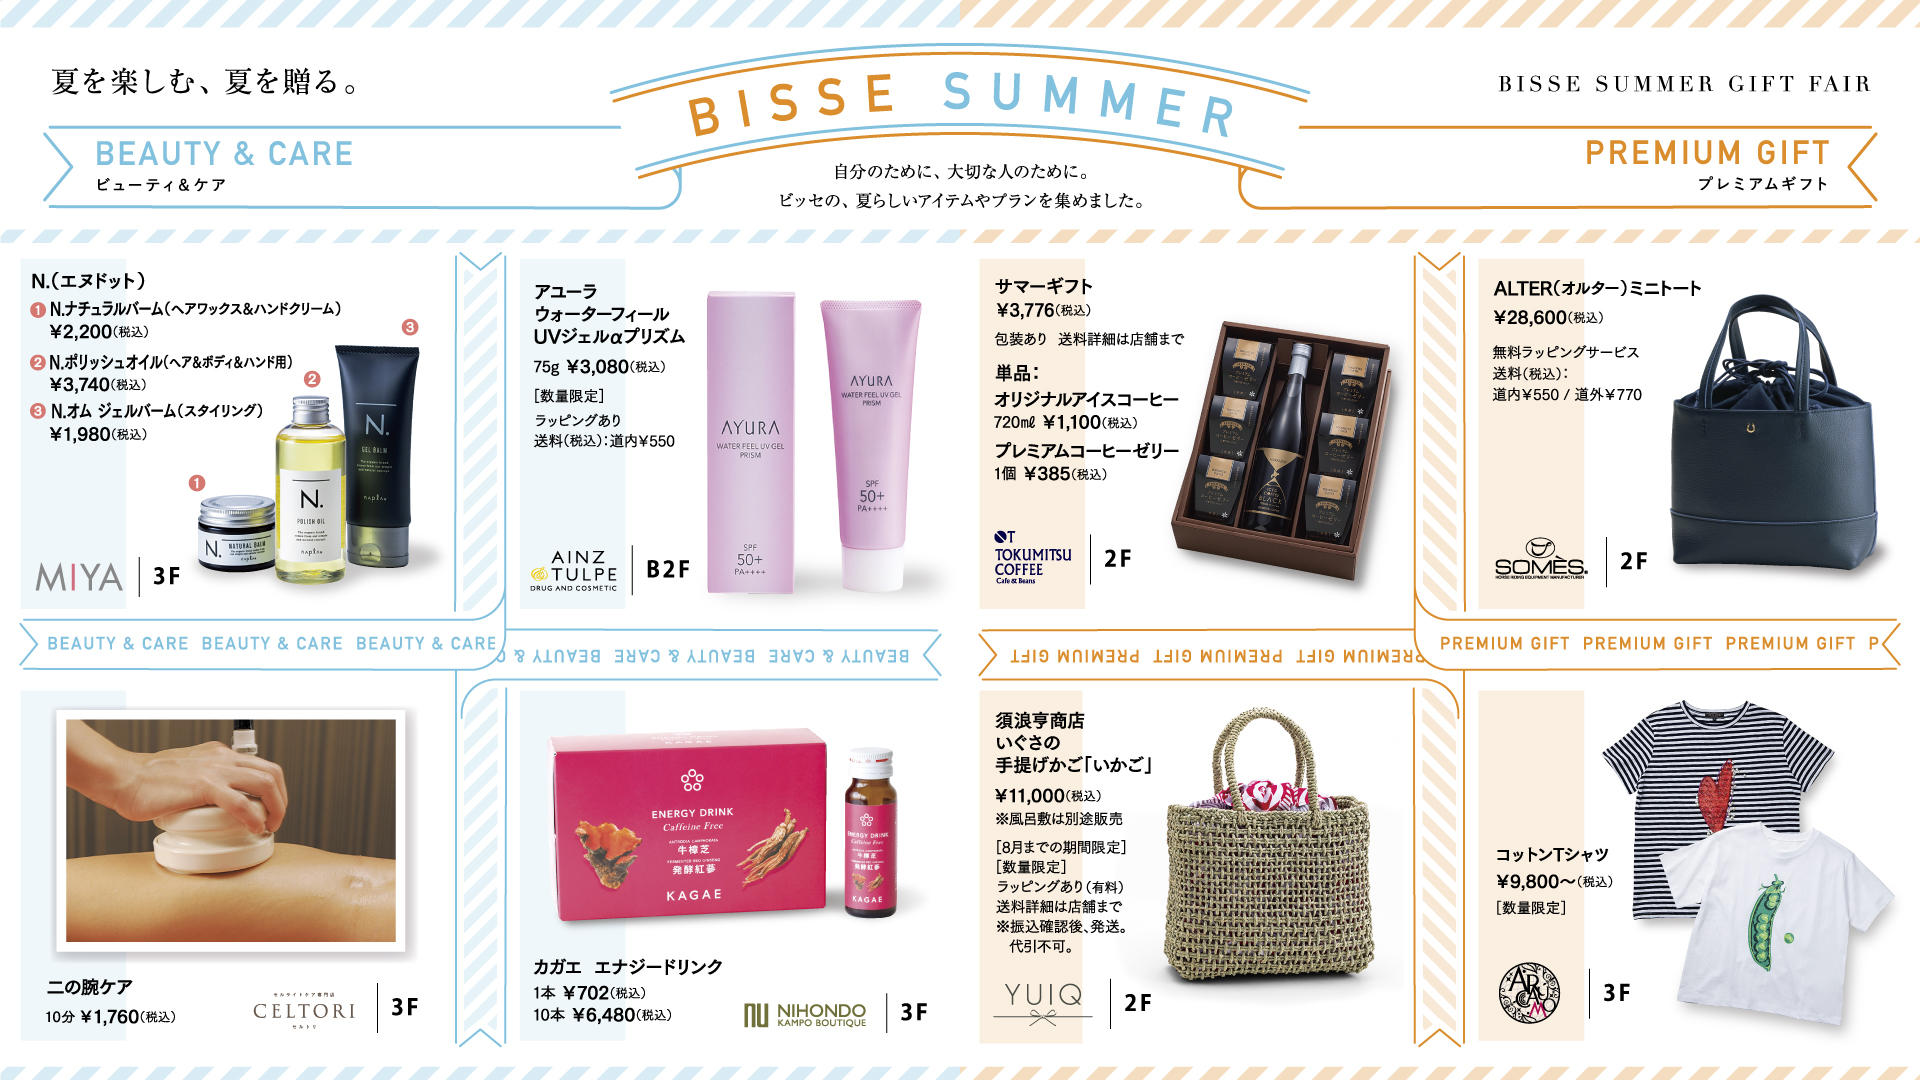 https://www.odori-bisse.com/info/news_210521_img3.jpg